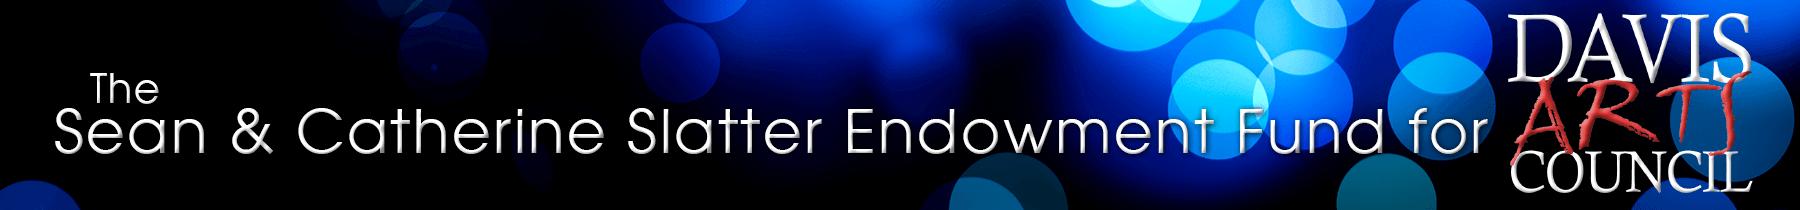 EndowmentFundBanner